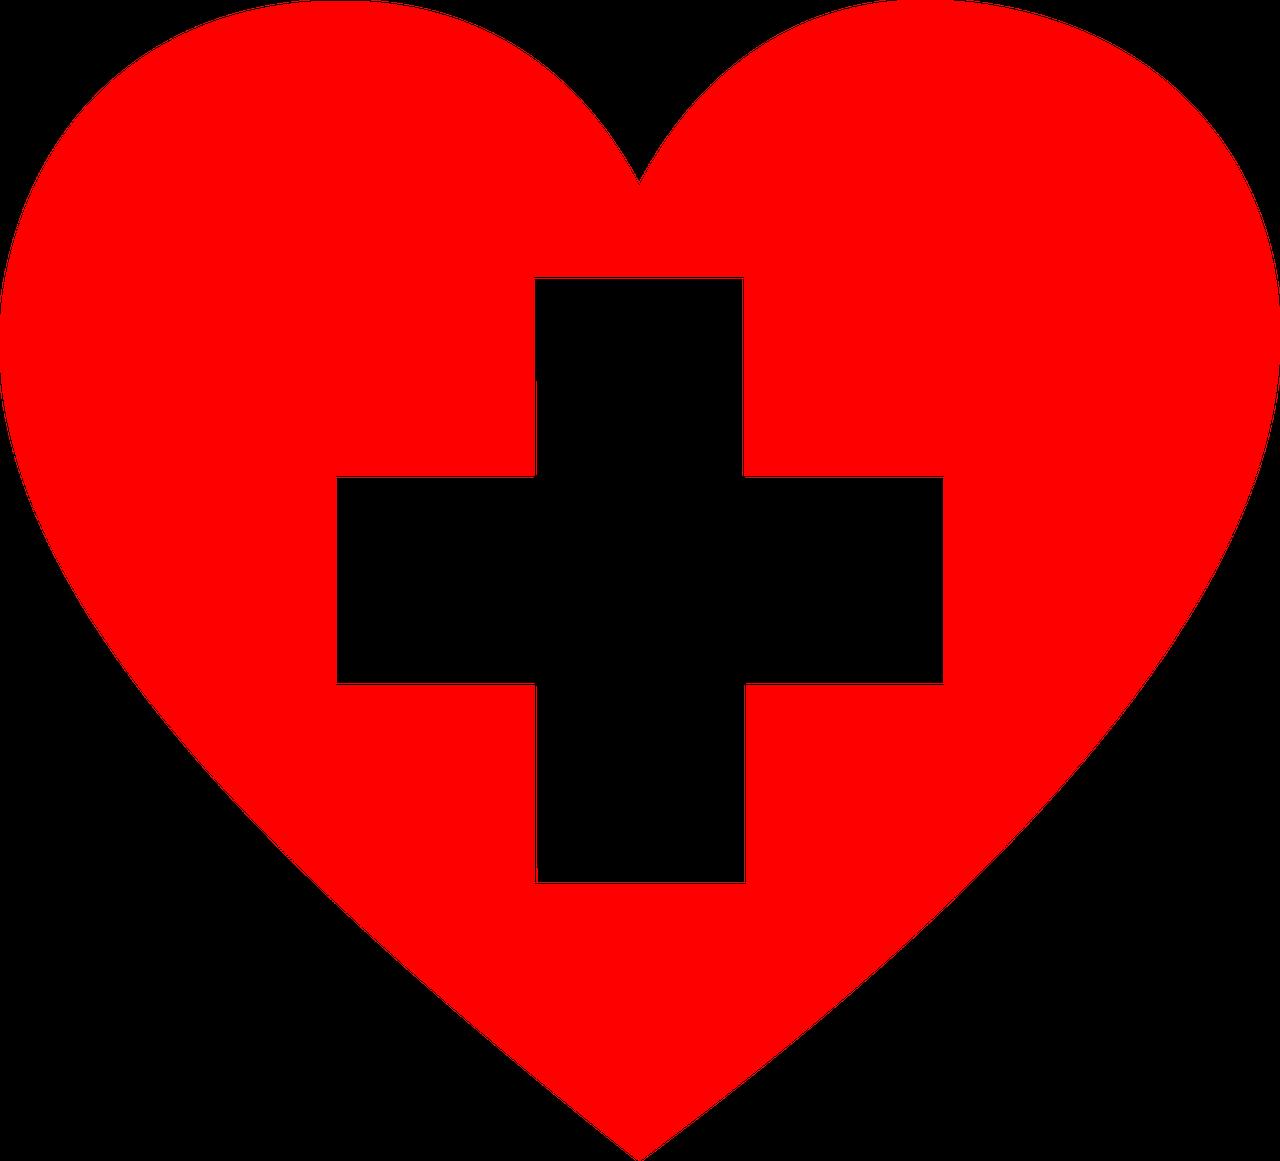 Cpr first aid class. Heat clipart row heart